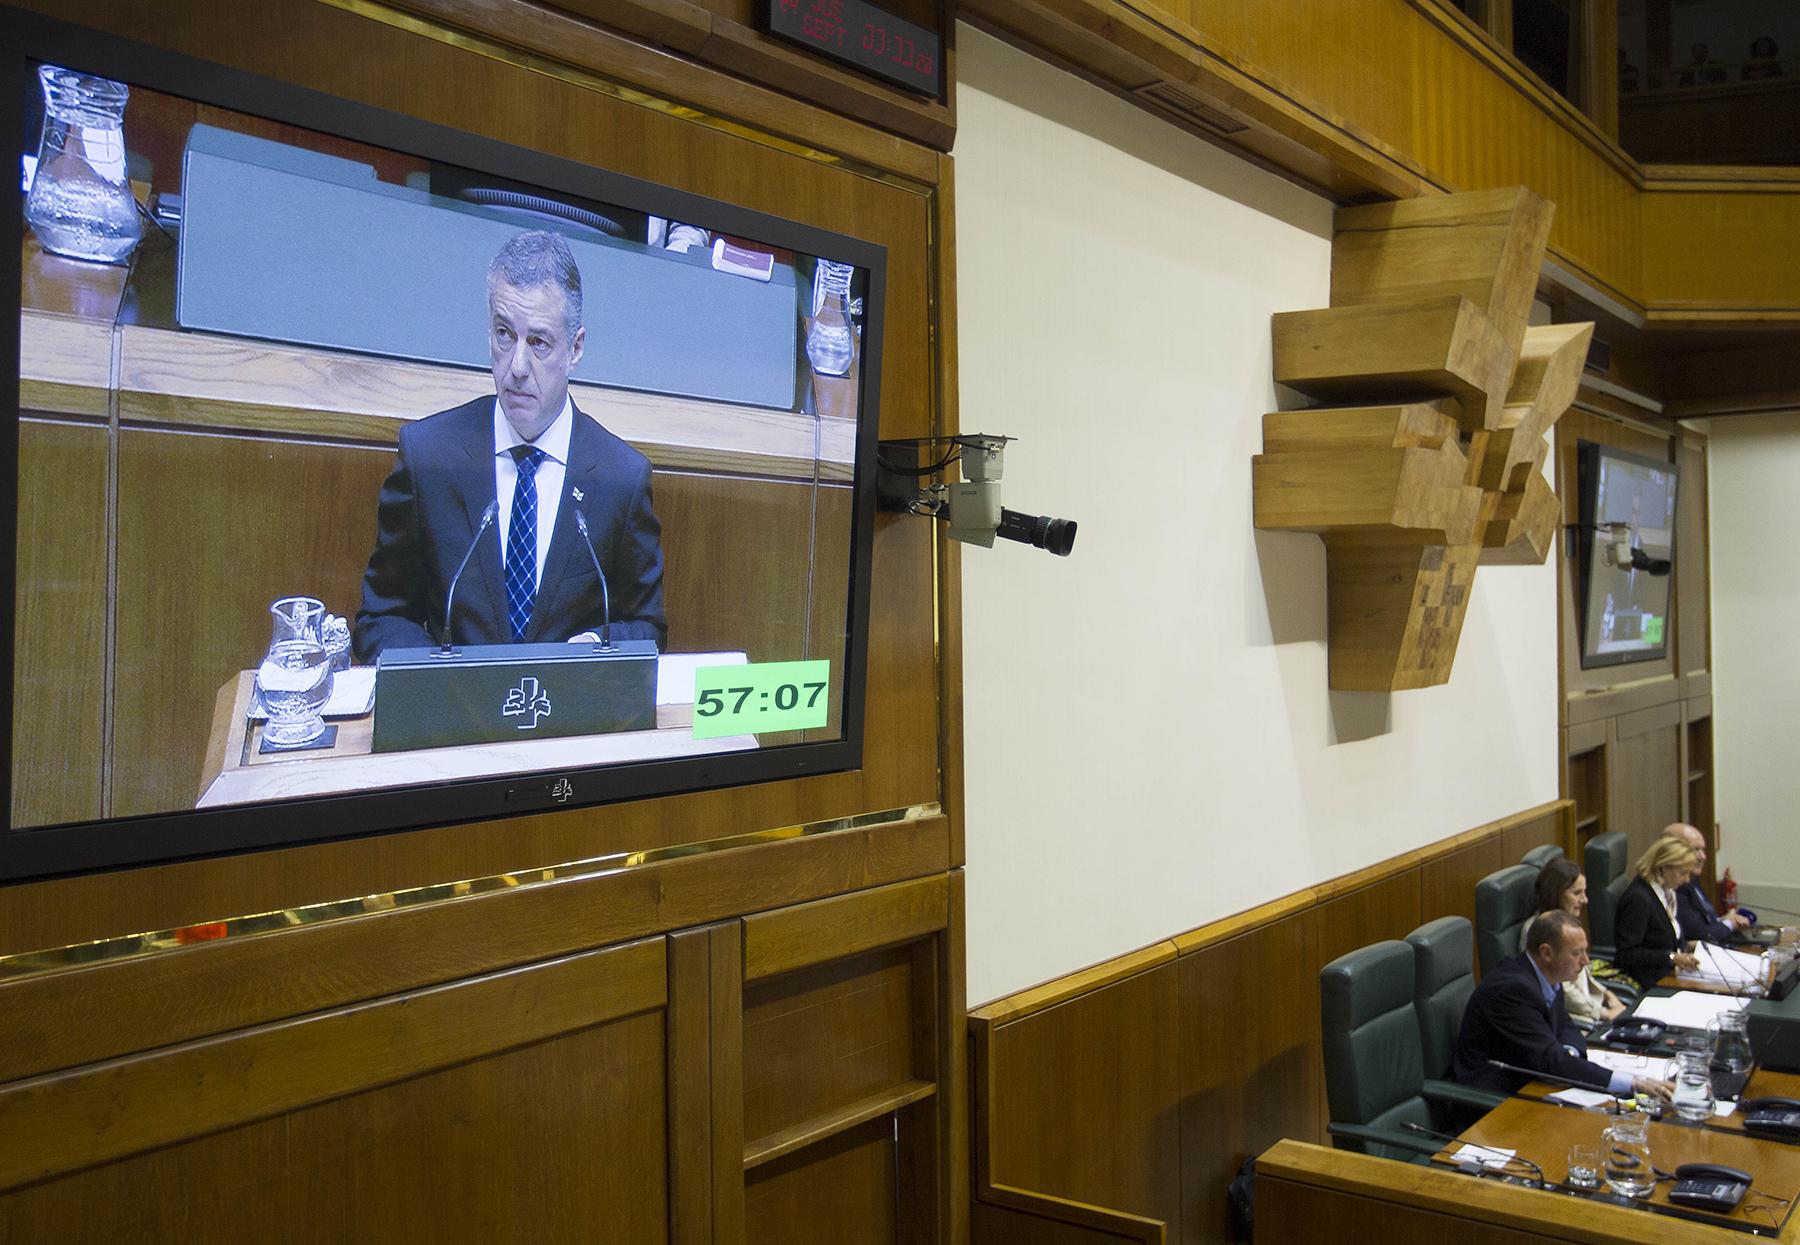 2015_09_24_lhk_parlamento_011.jpg